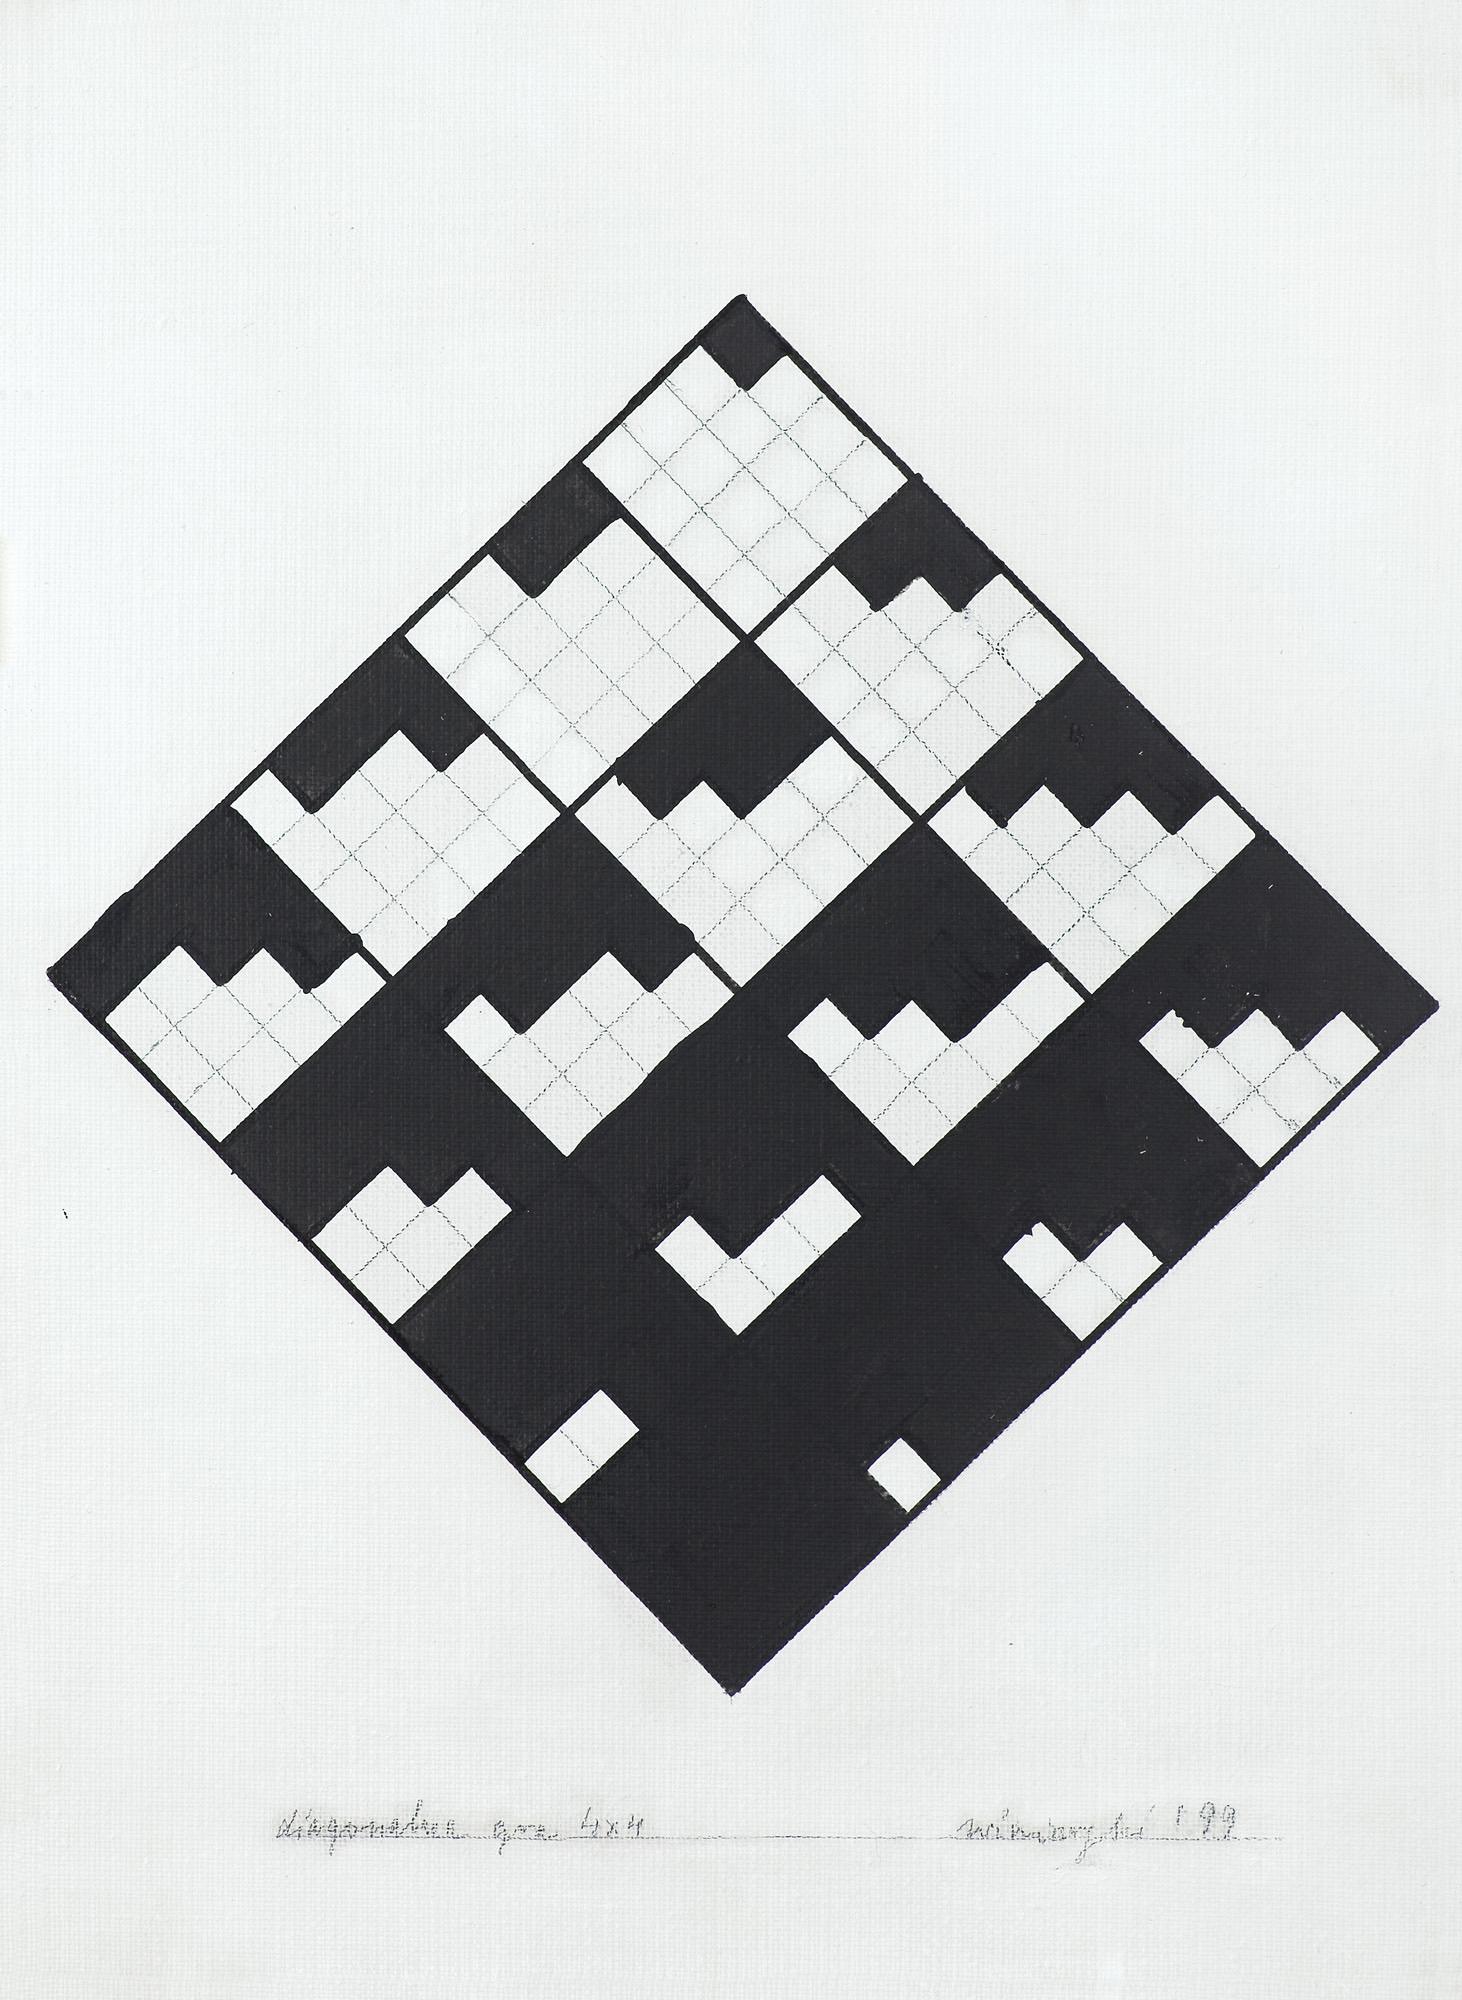 DIAGONALNA GRA, 1999